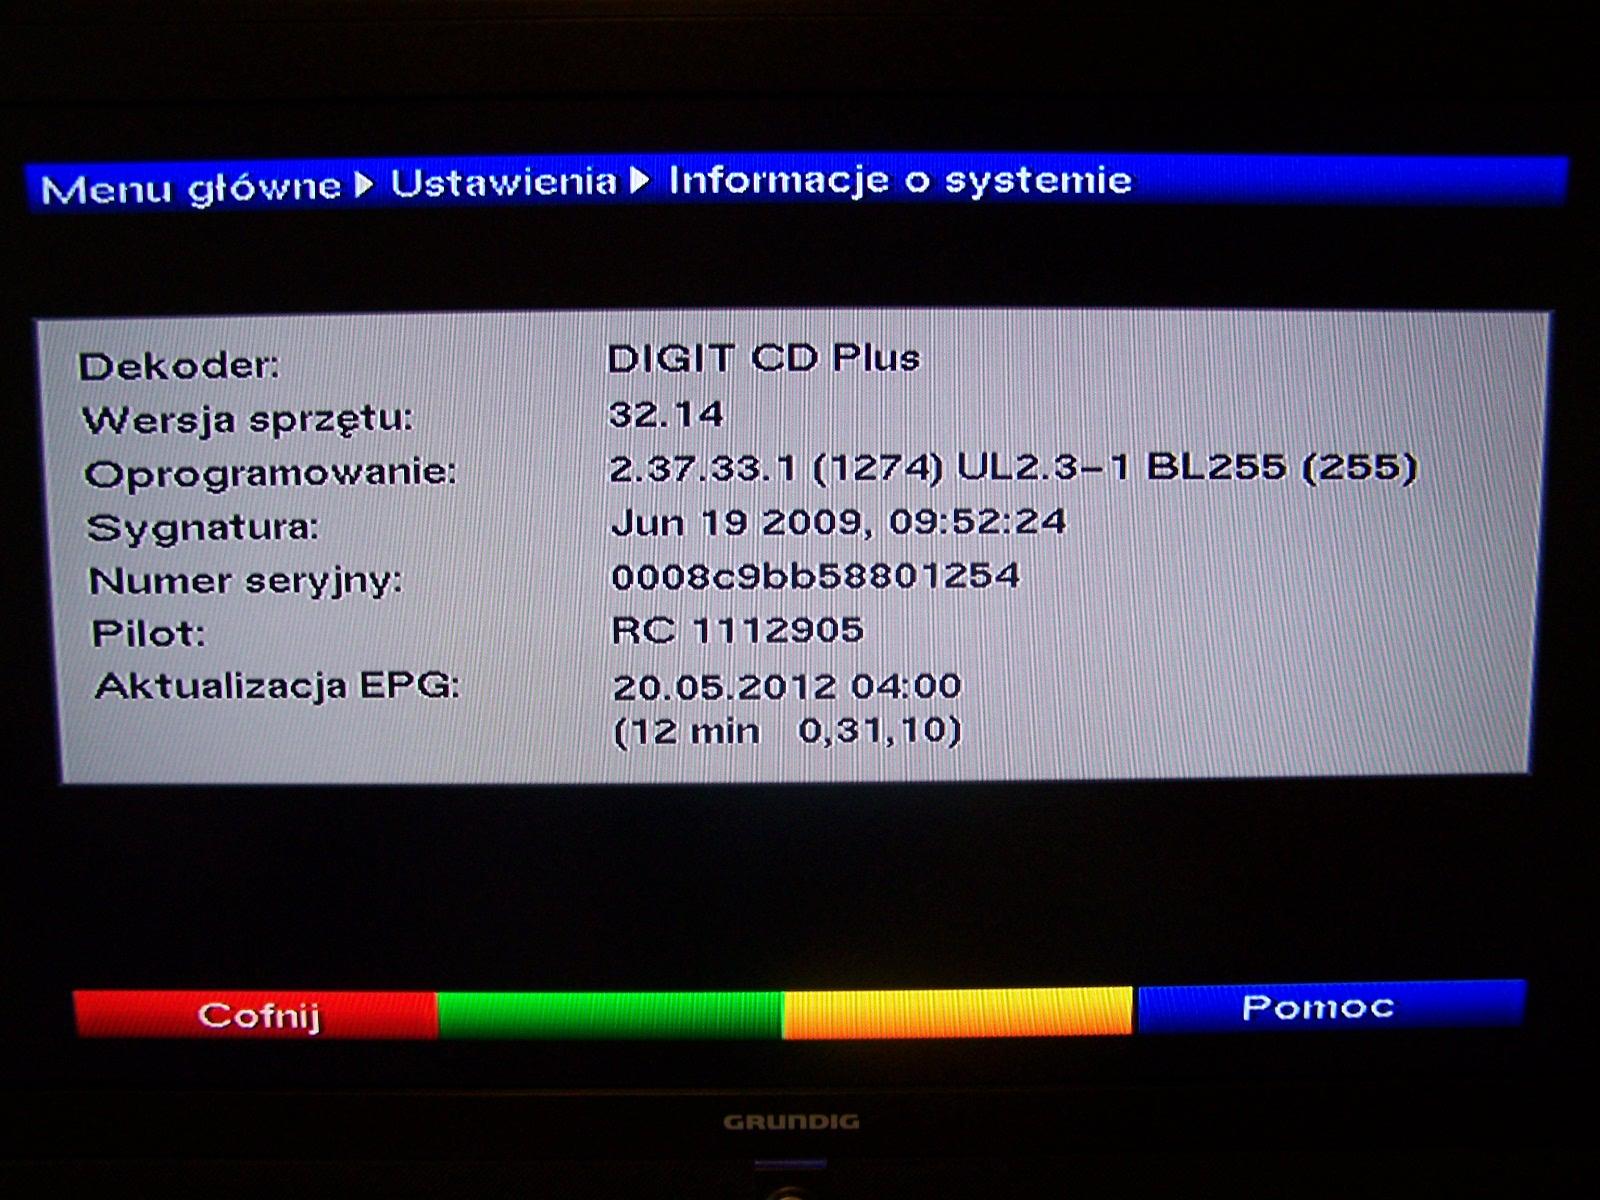 TECHNISAT DIGIT CD PLUS - TNK - Brak sygna�u oraz kana��w.